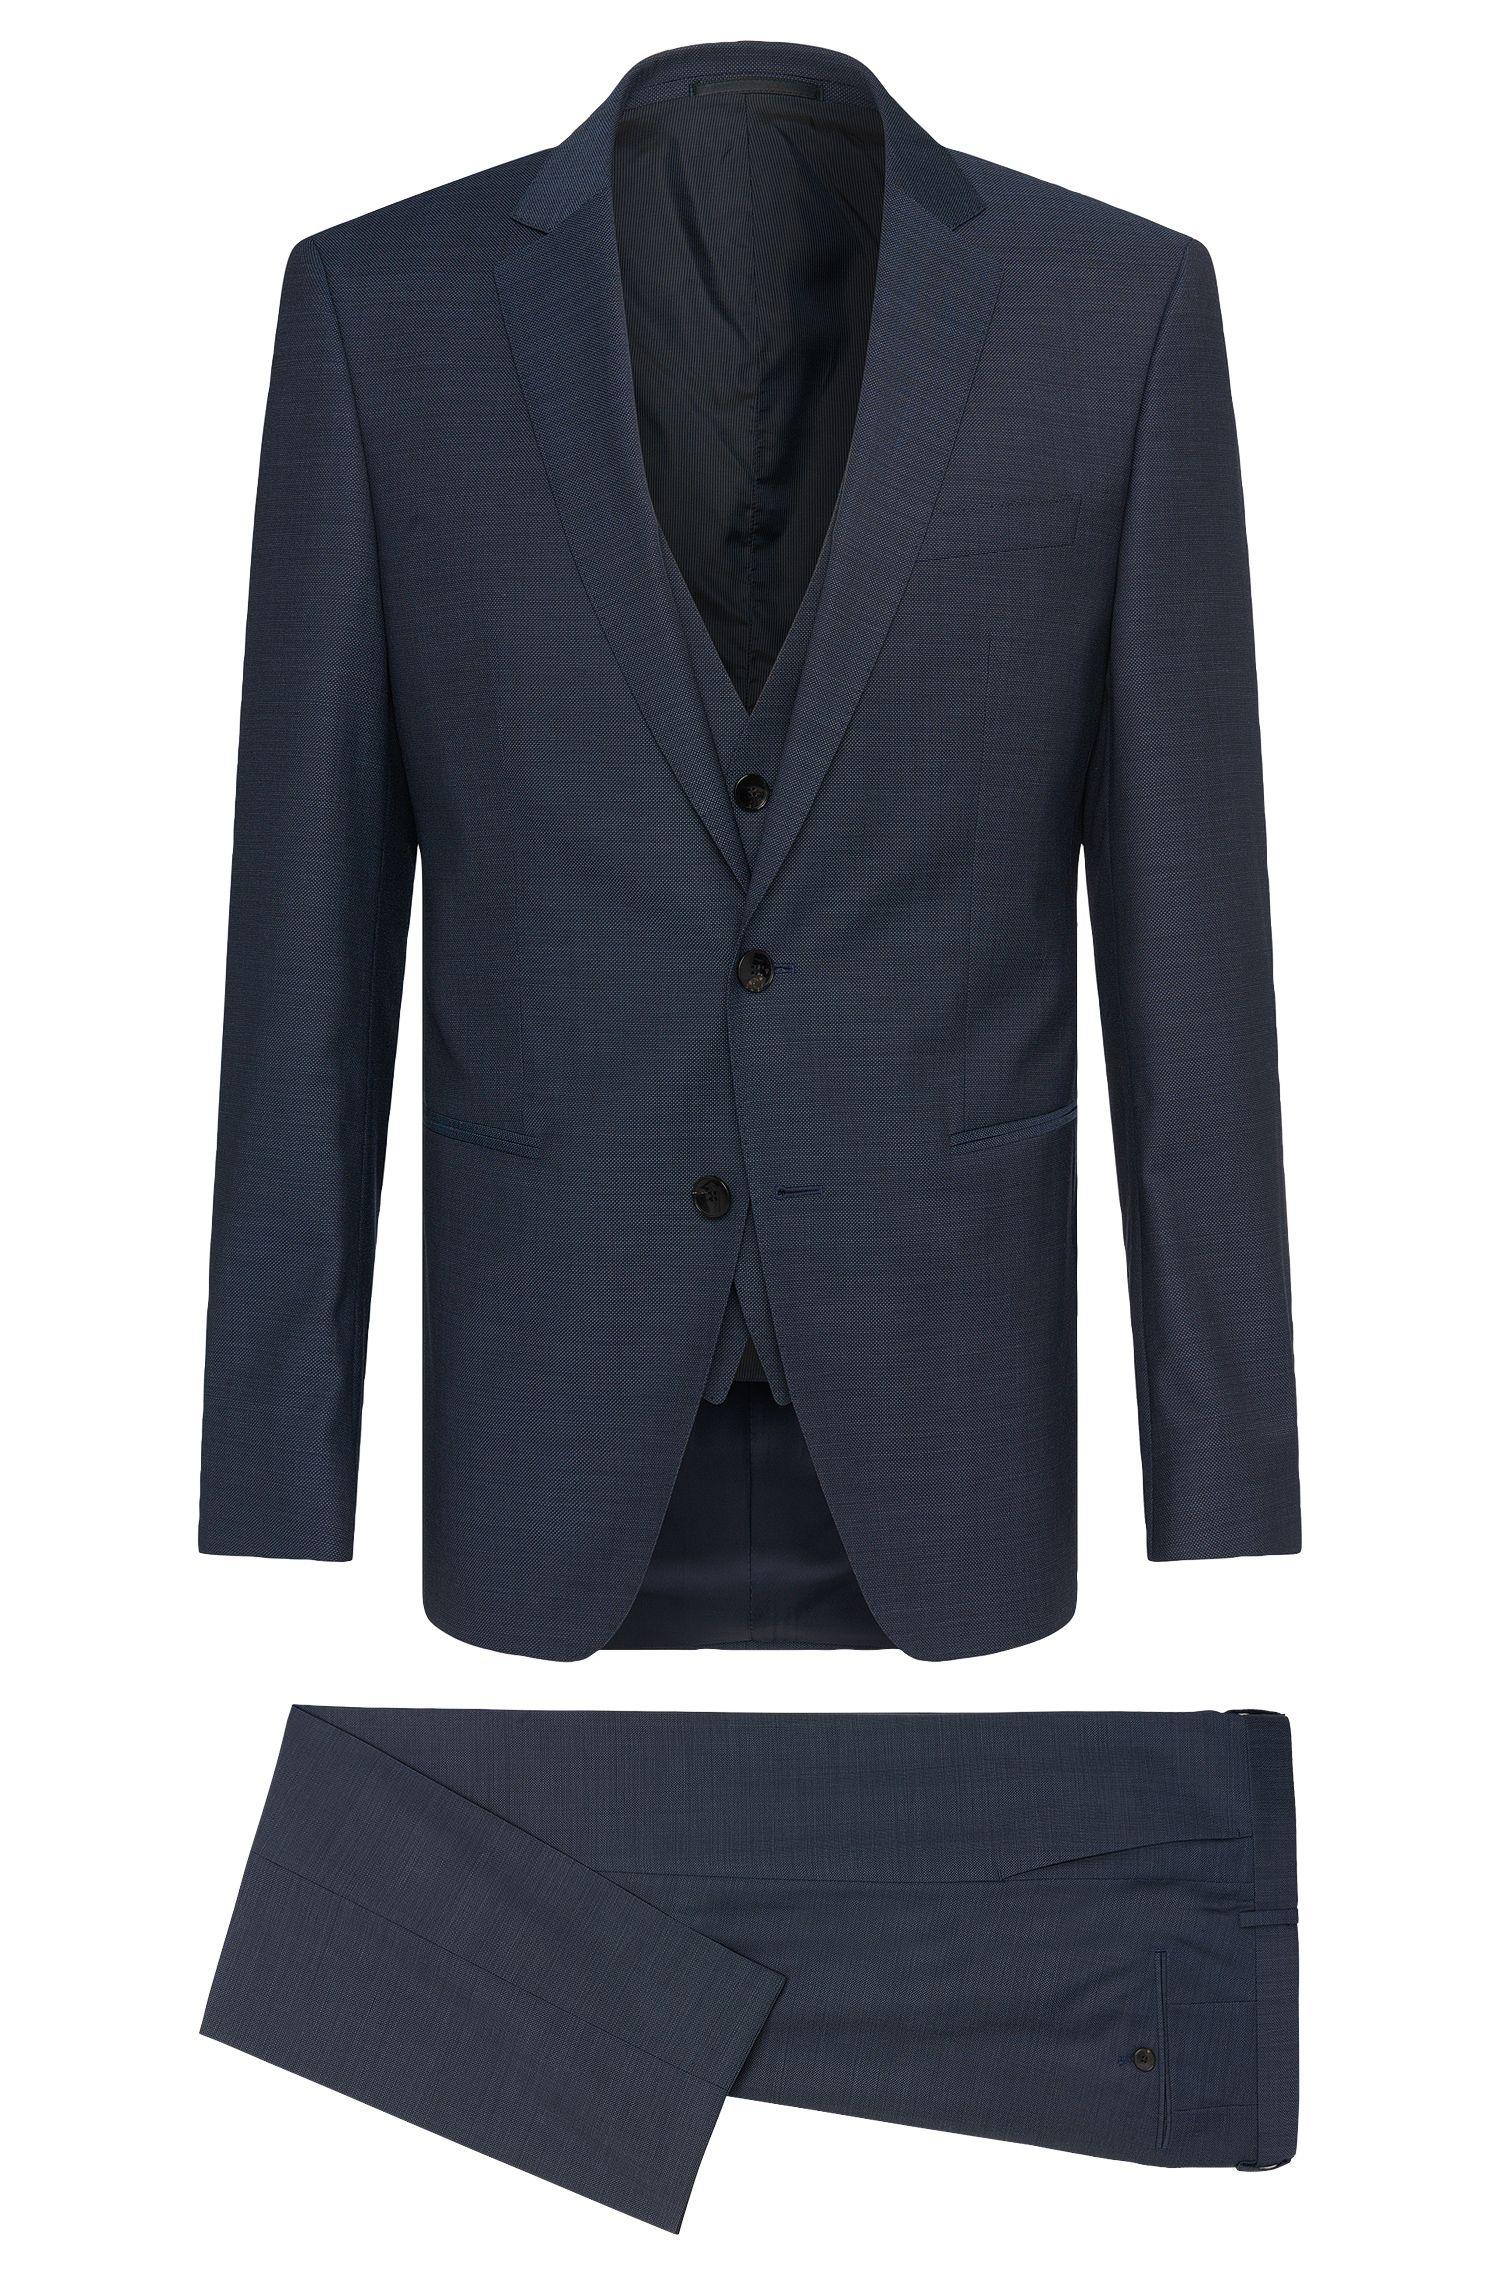 Sharkskin Italian Super 130 Virgin Wool 3-Piece Suit, Slim Fit | Hamsen/Glen WE